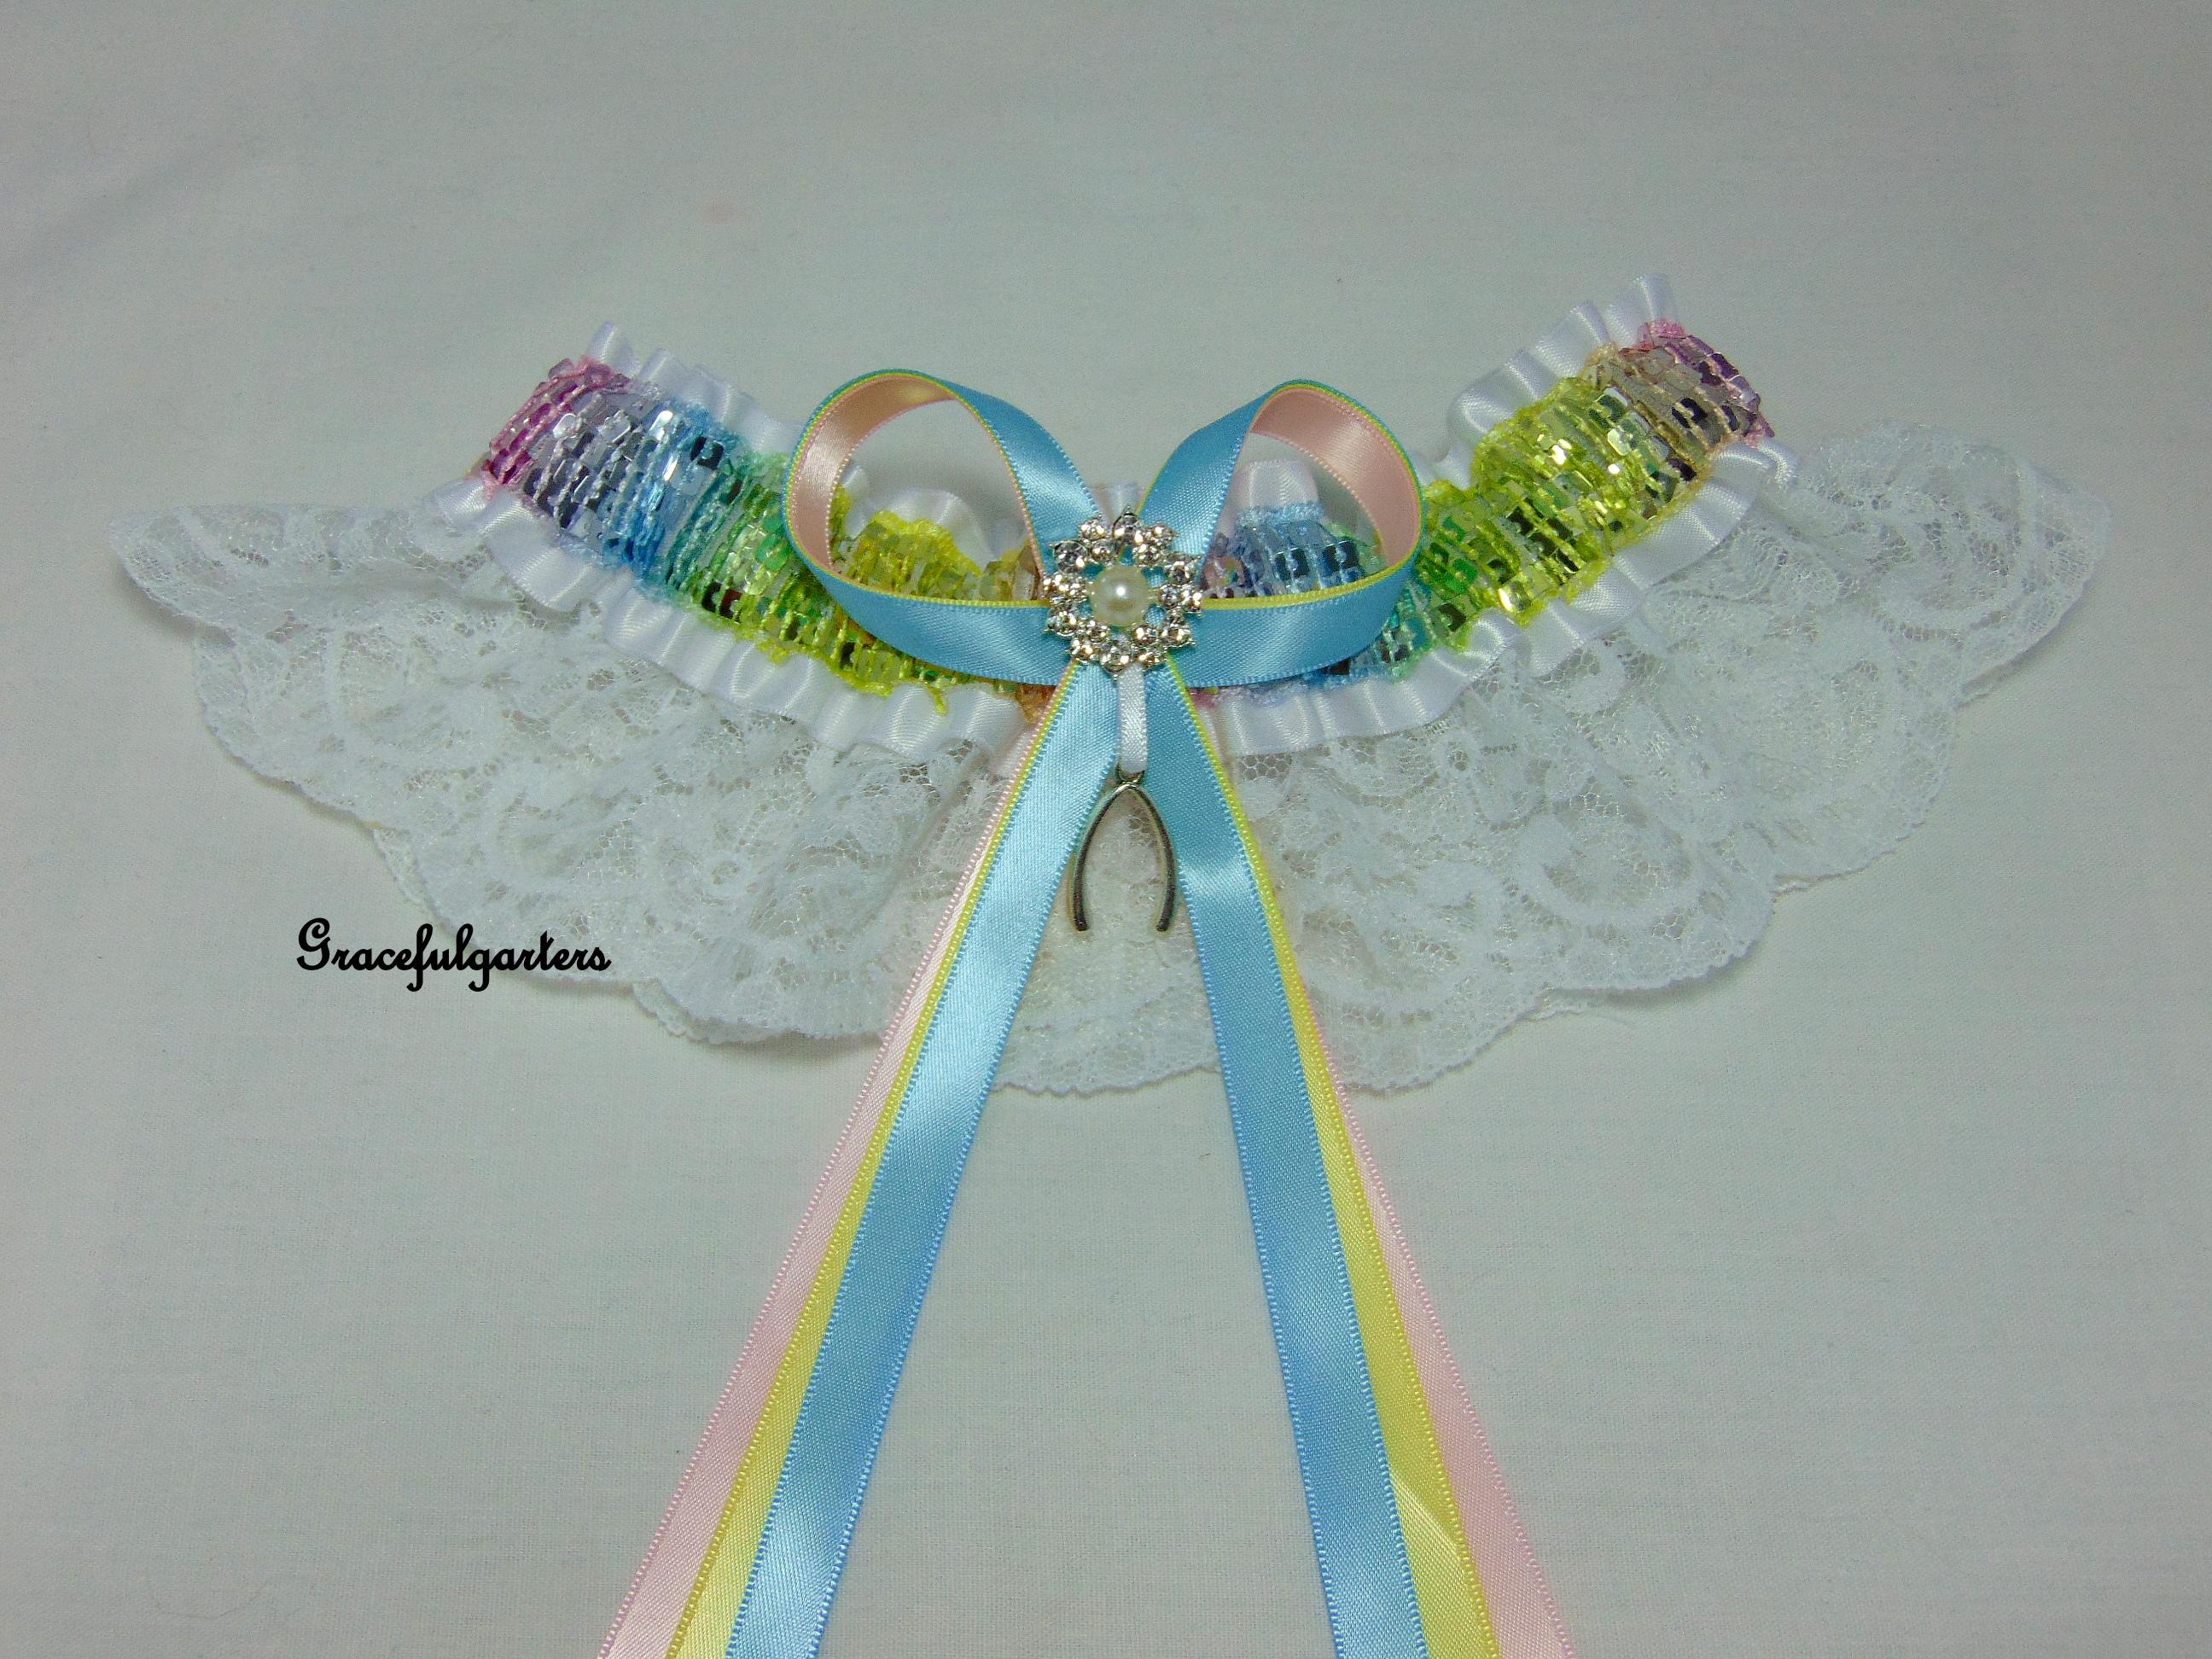 Rainbow Sequin Wishbone Gay Pride Lace Bridal Wedding Garter